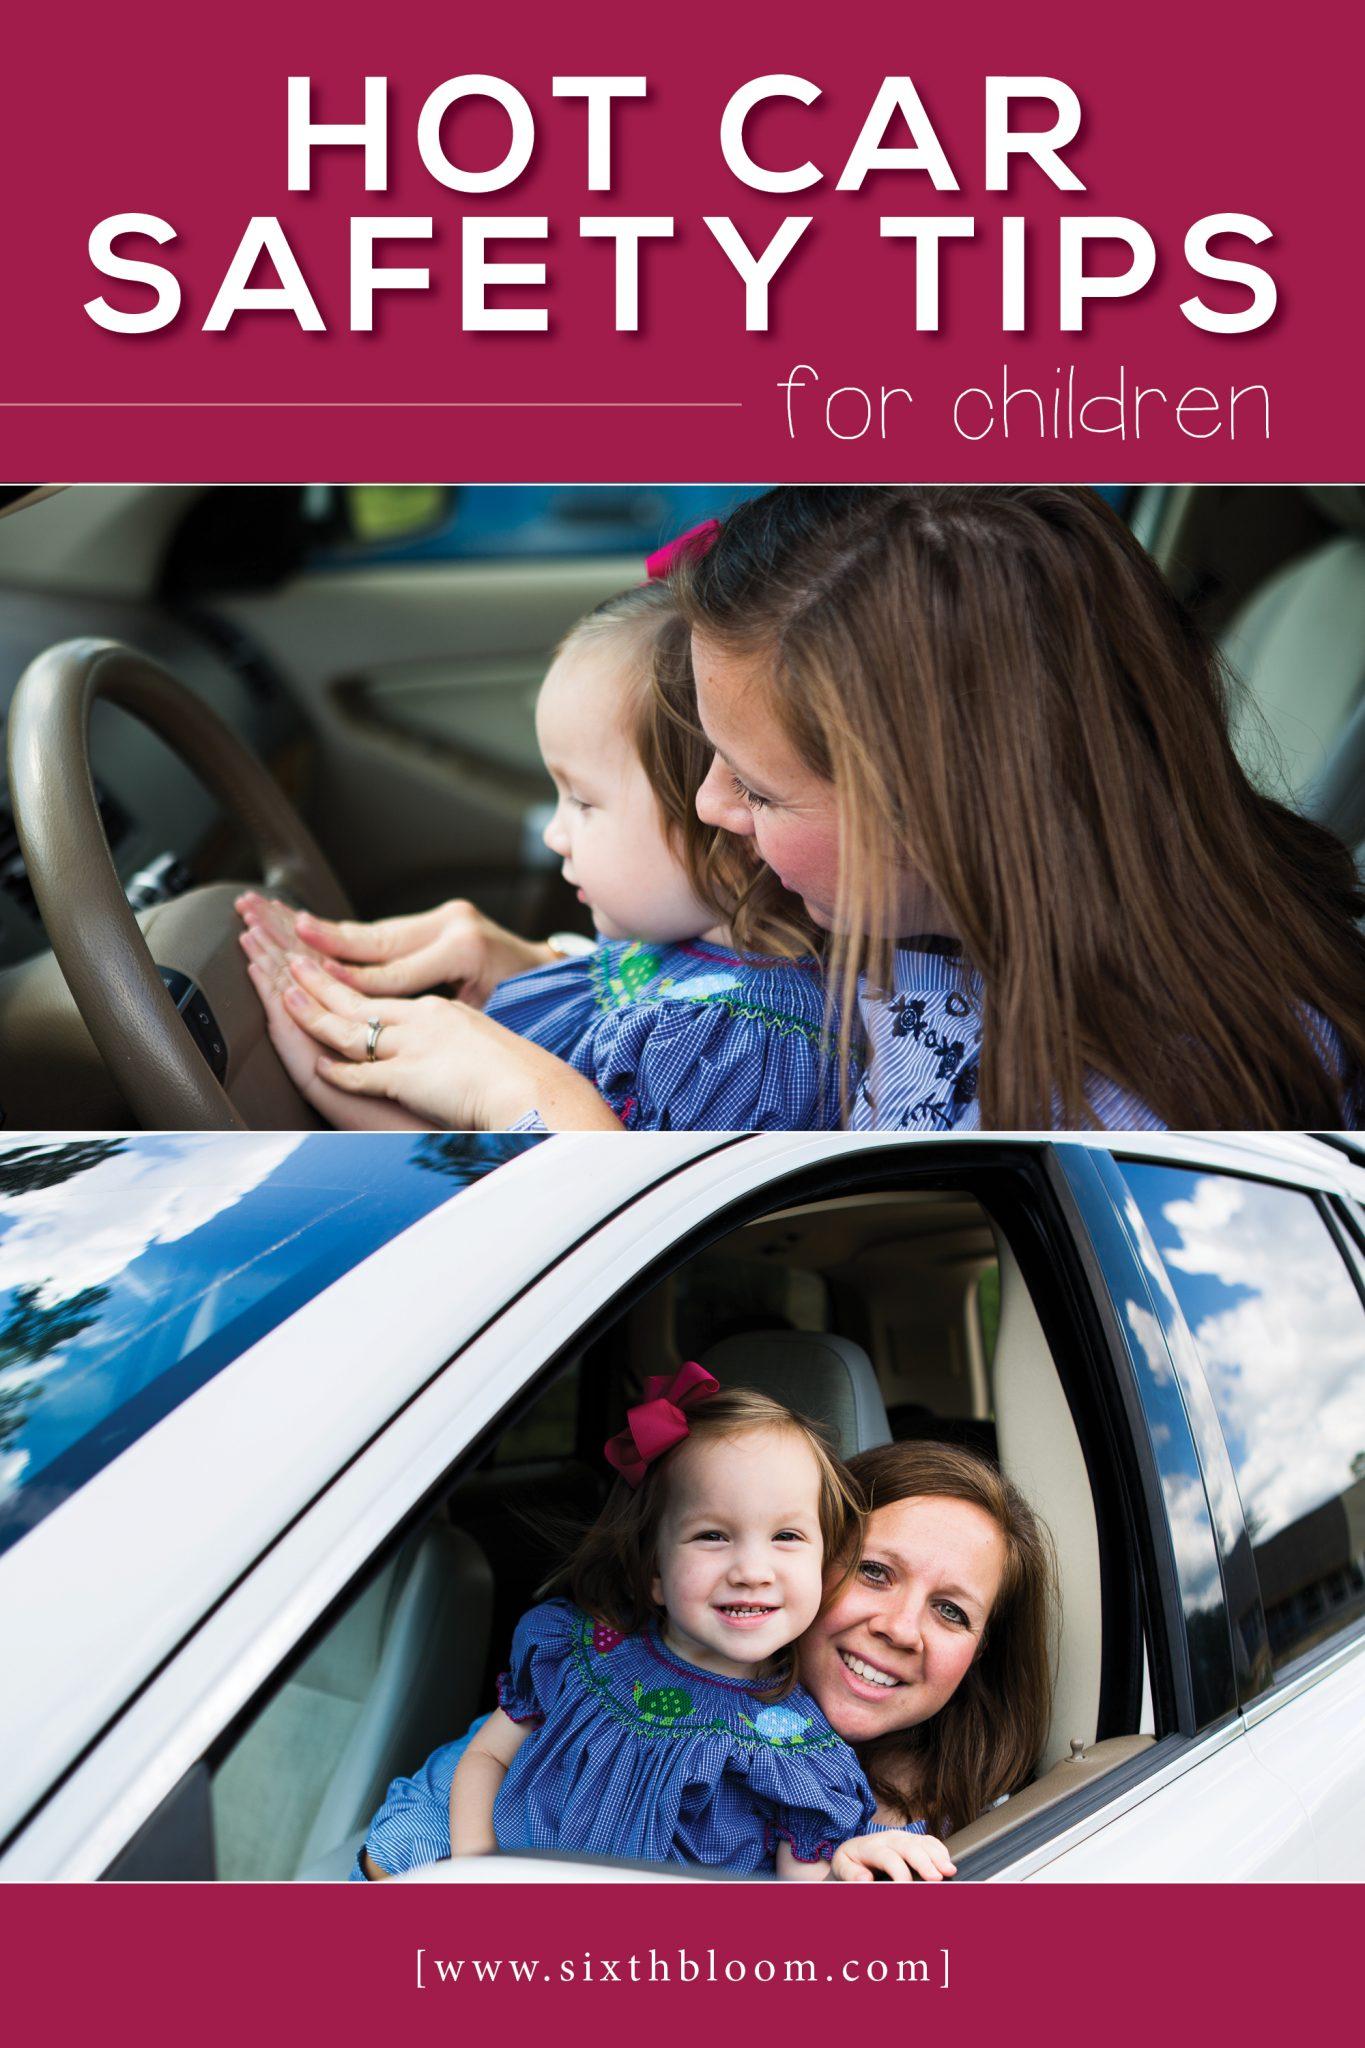 hot car safety tips for children